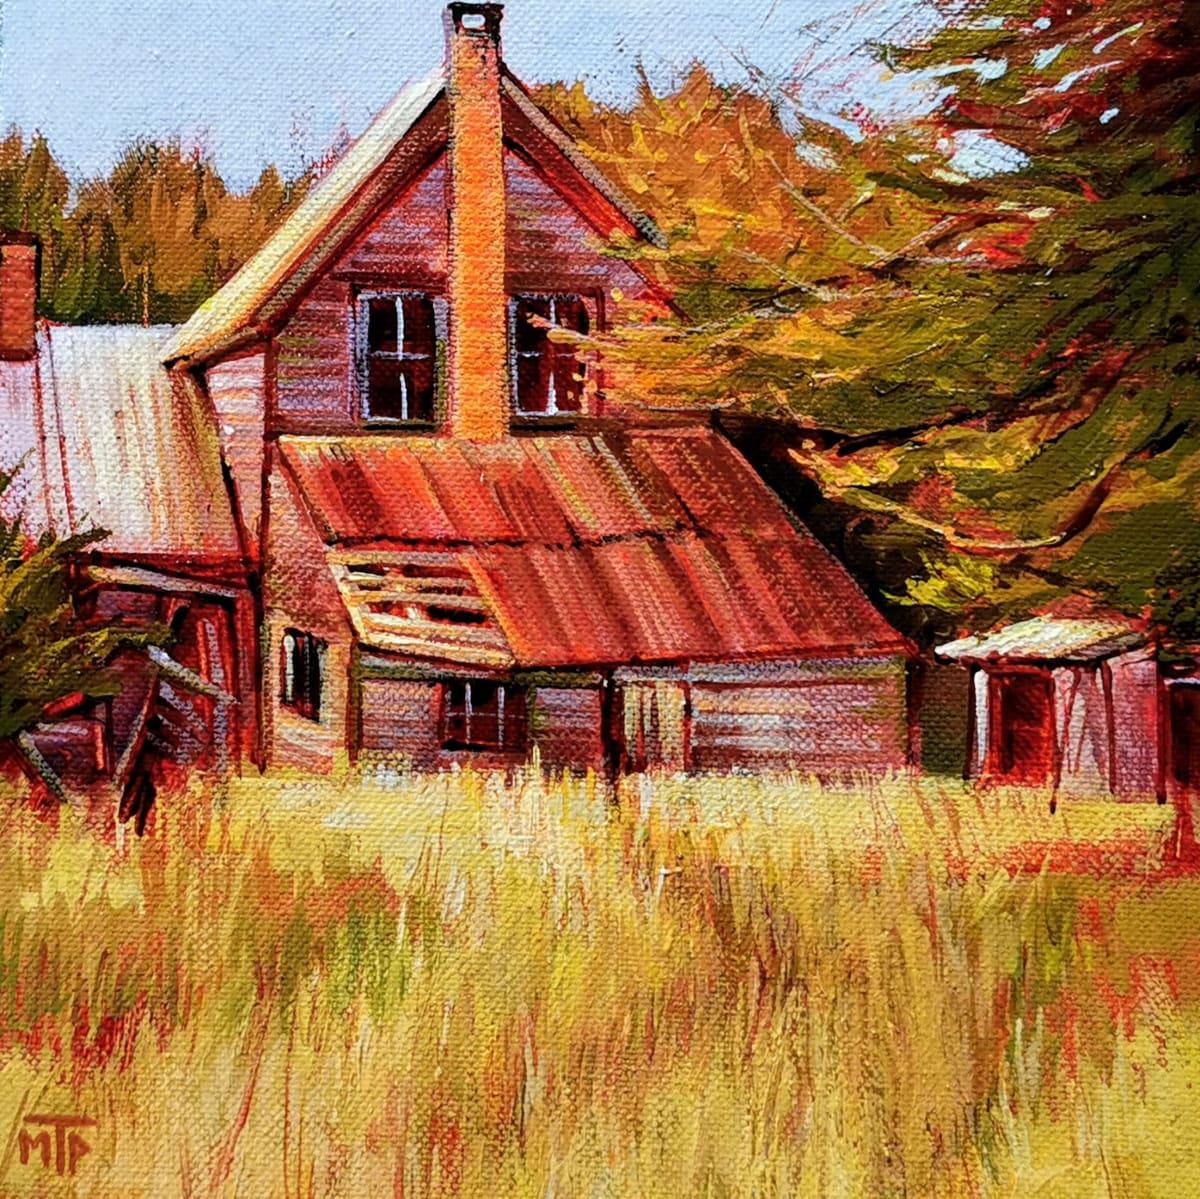 Old Homestead by Tatjana Mirkov-Popovicki